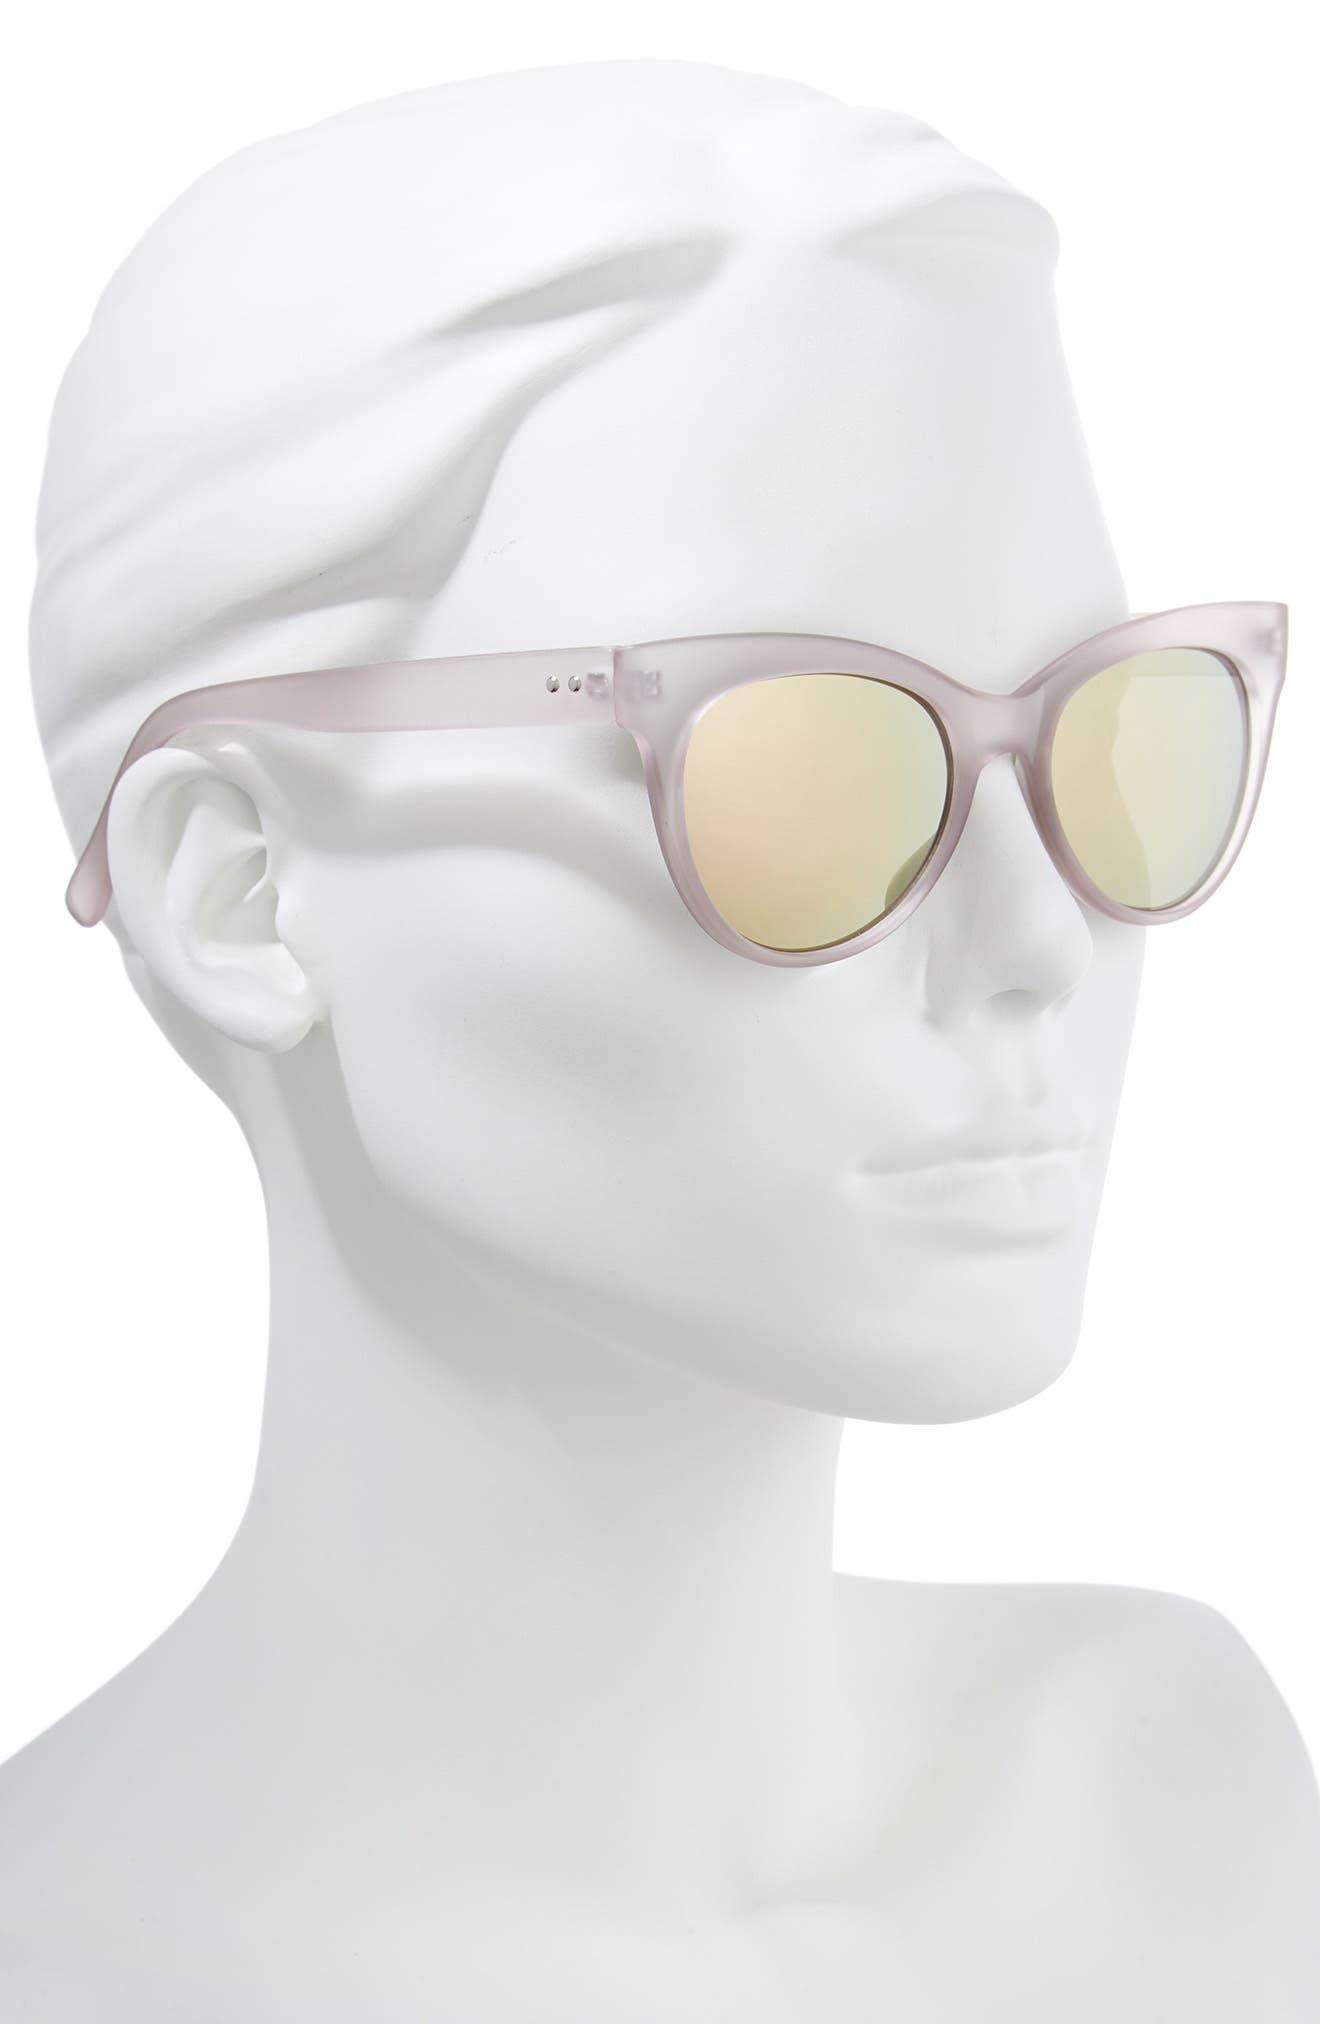 56mm Cat Eye Sunglasses,                             Alternate thumbnail 2, color,                             Milky Pink/ Pink